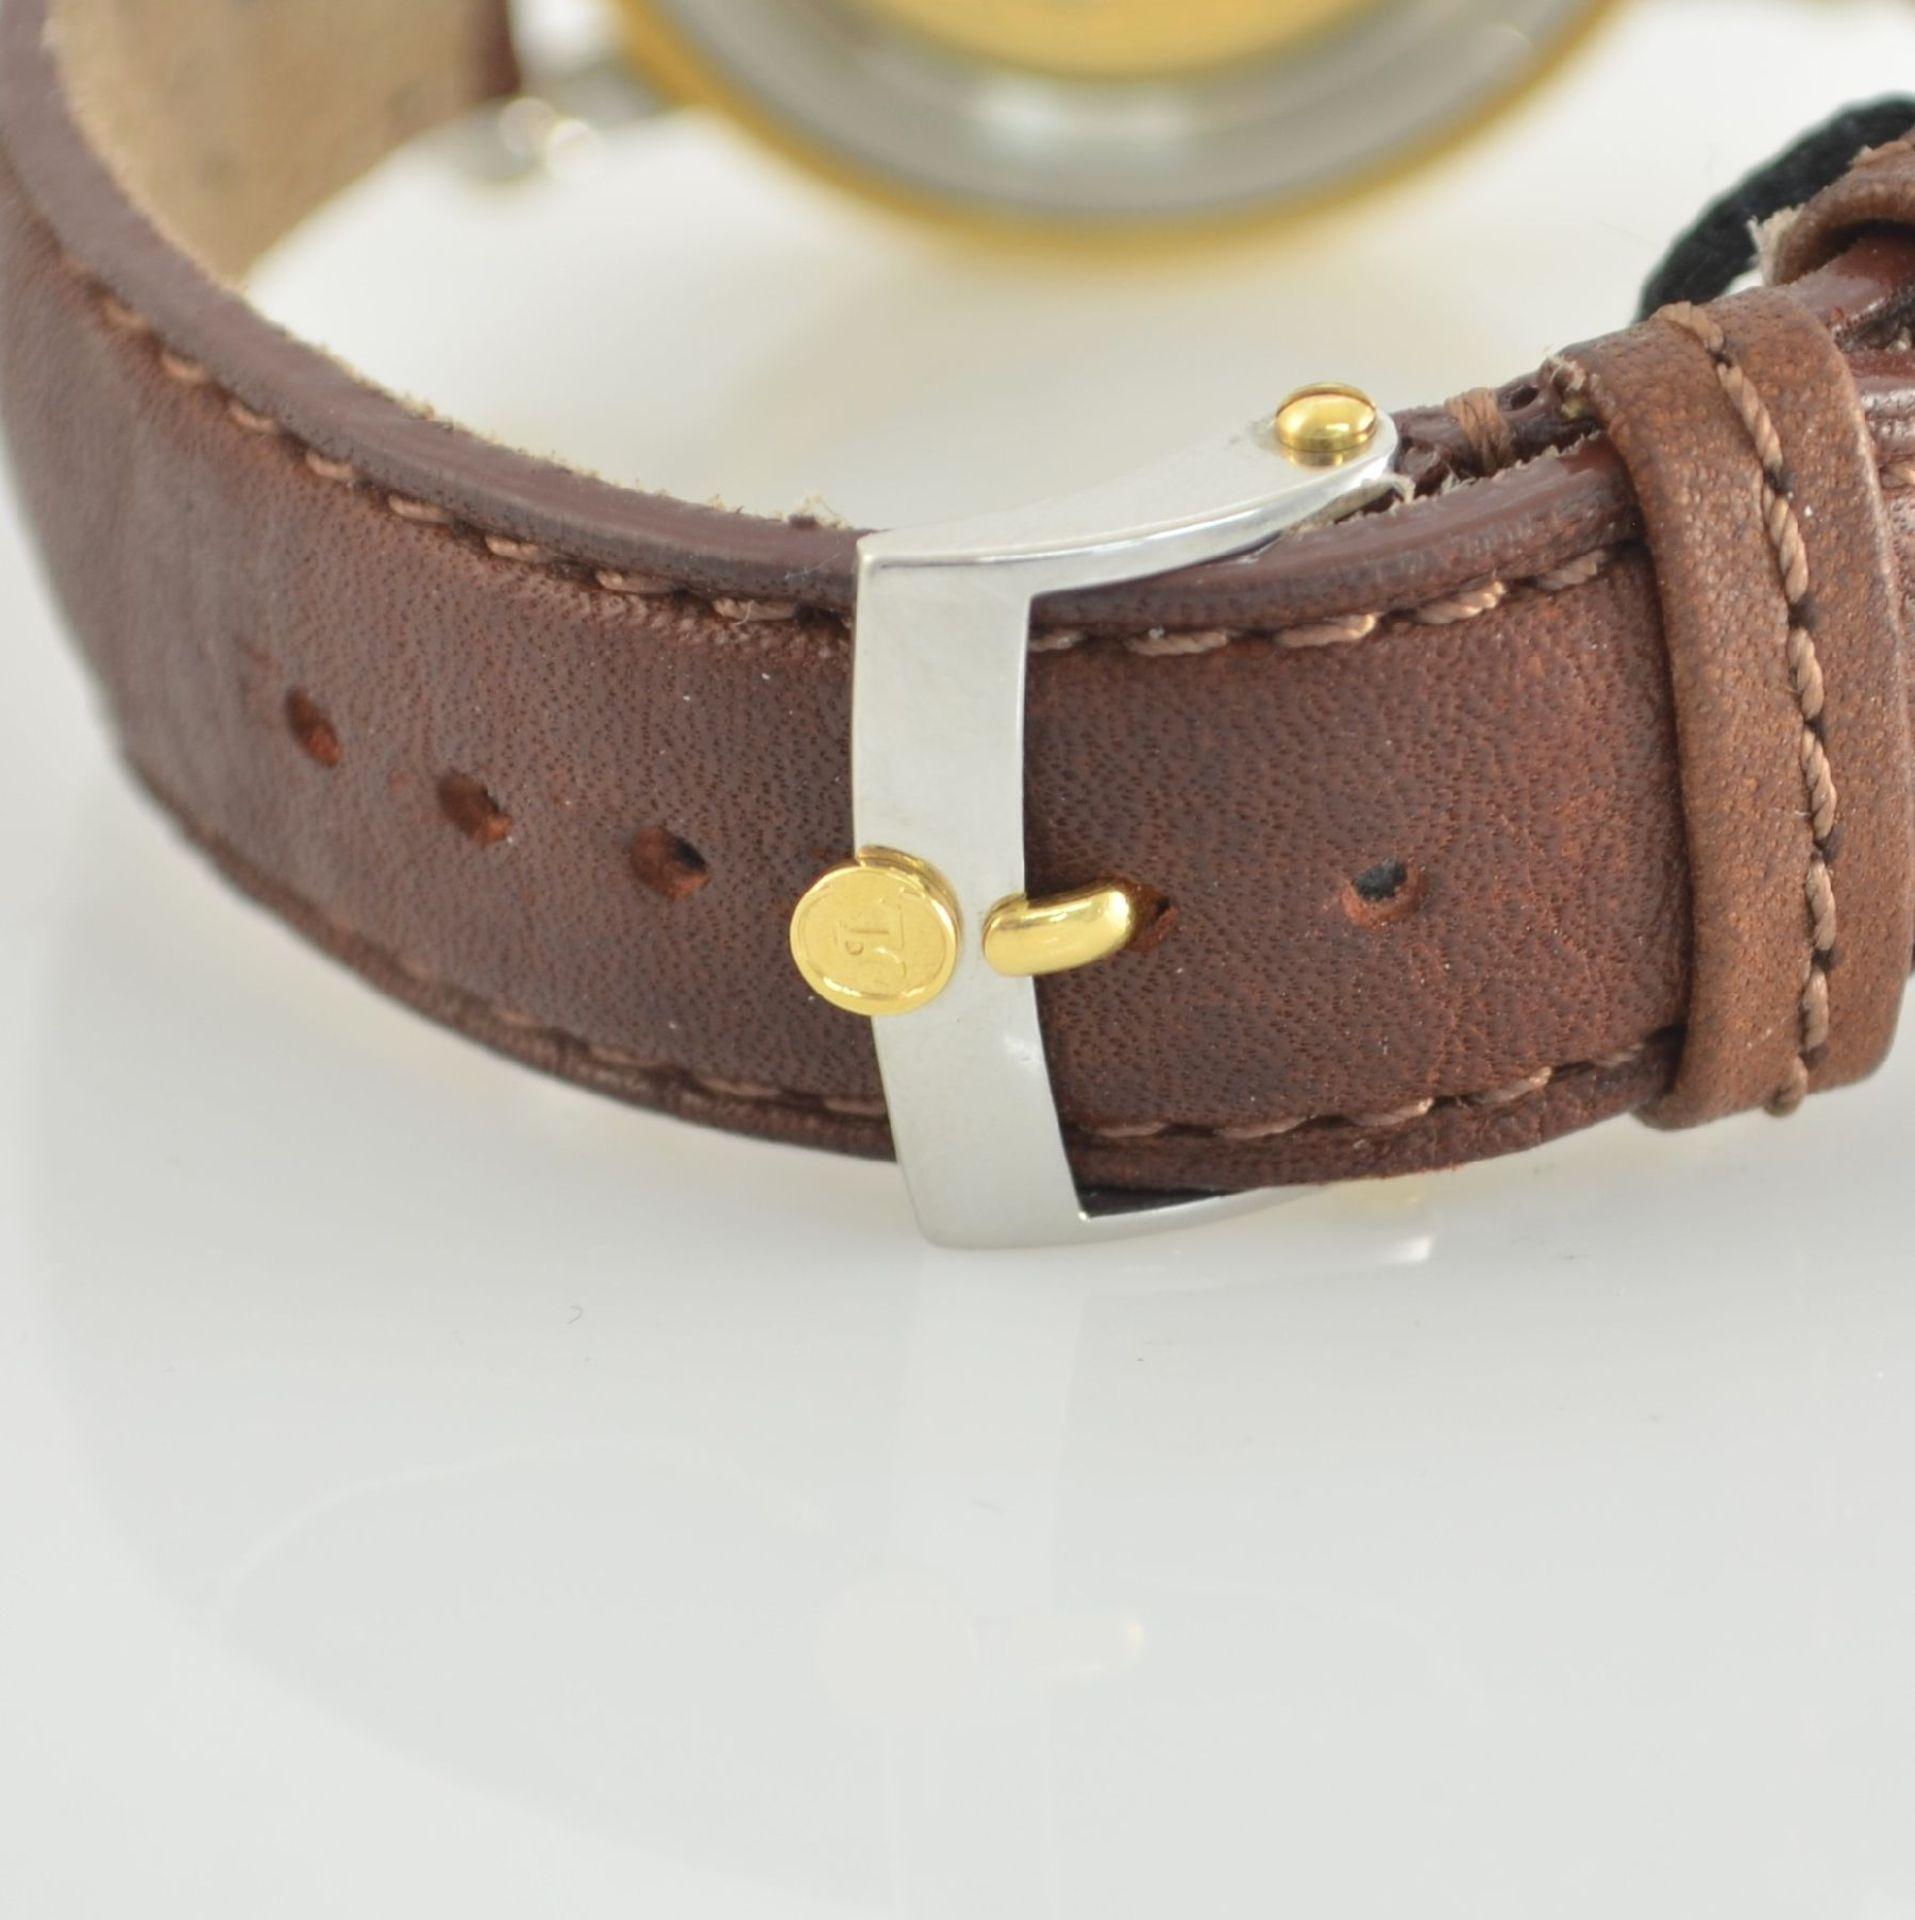 CHRONOSWISS Chronometer Herrenarmbanduhr, Automatik, Ref. CH 2822, Edelstahl/Gold kombiniert inkl. - Bild 5 aus 7